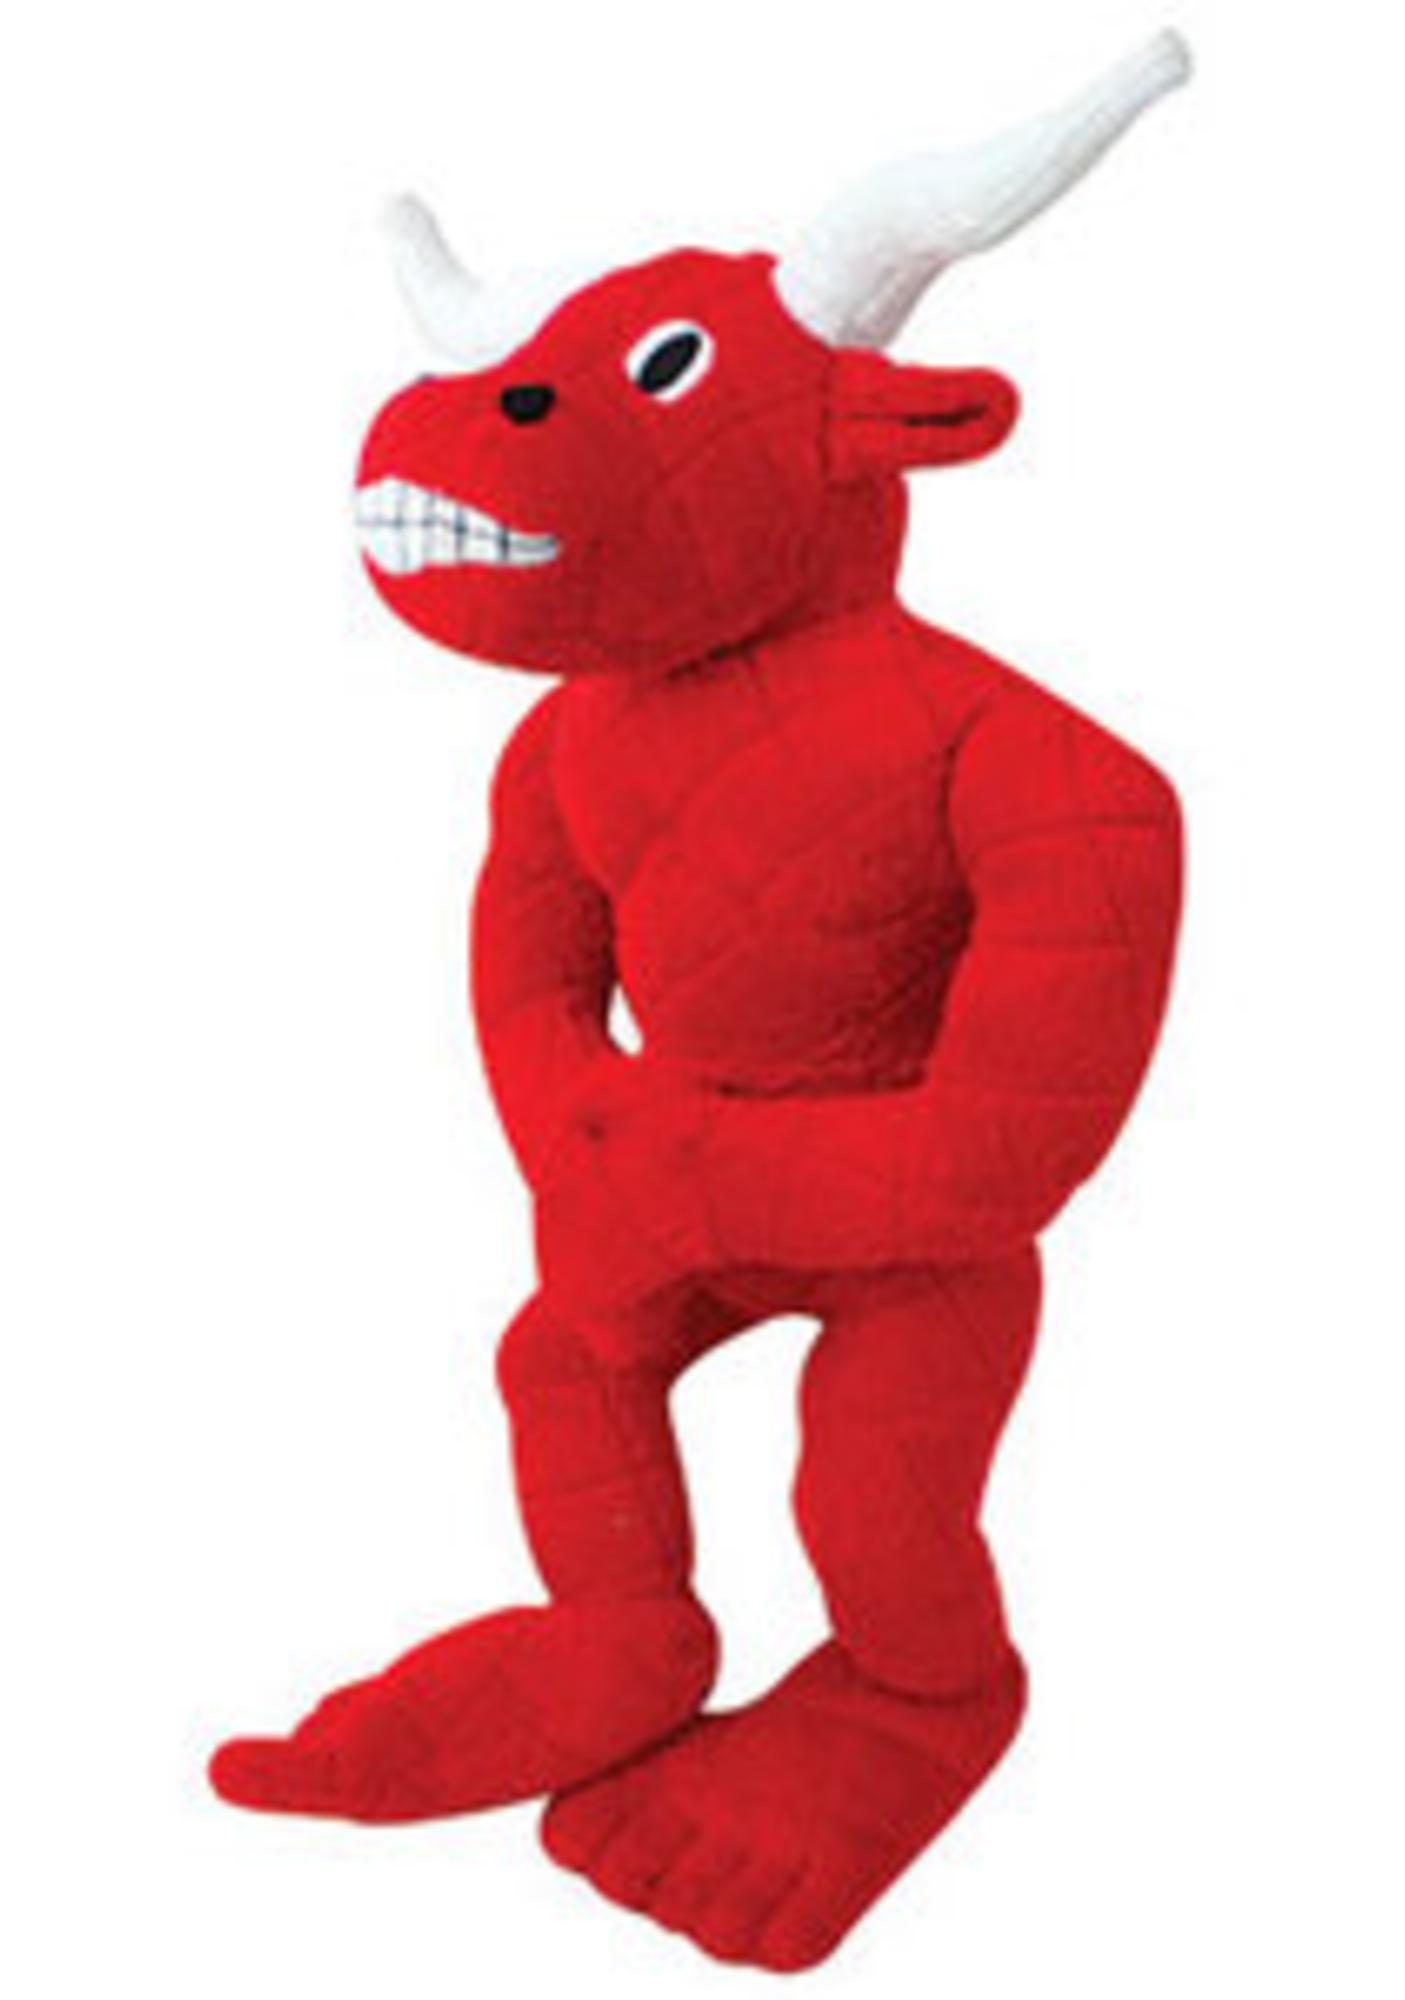 Minny Minotaur Mighty Dog Toy